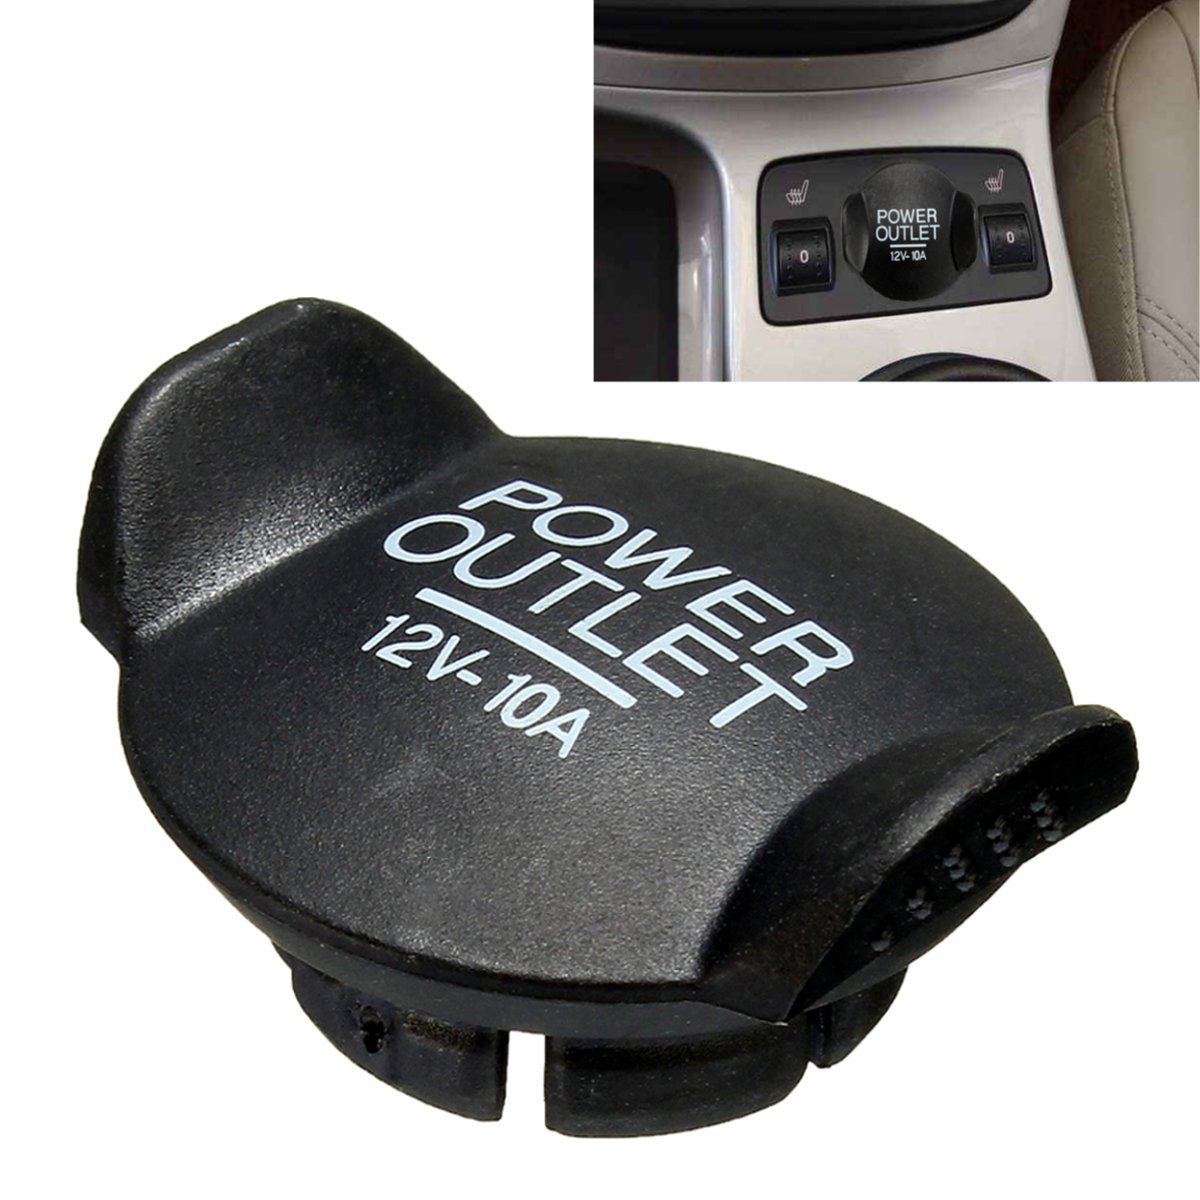 1PC Power 12V Socket Lighter Cigarette Outlet Cover Cap For Ford /Focus /Fiesta /Mondeo